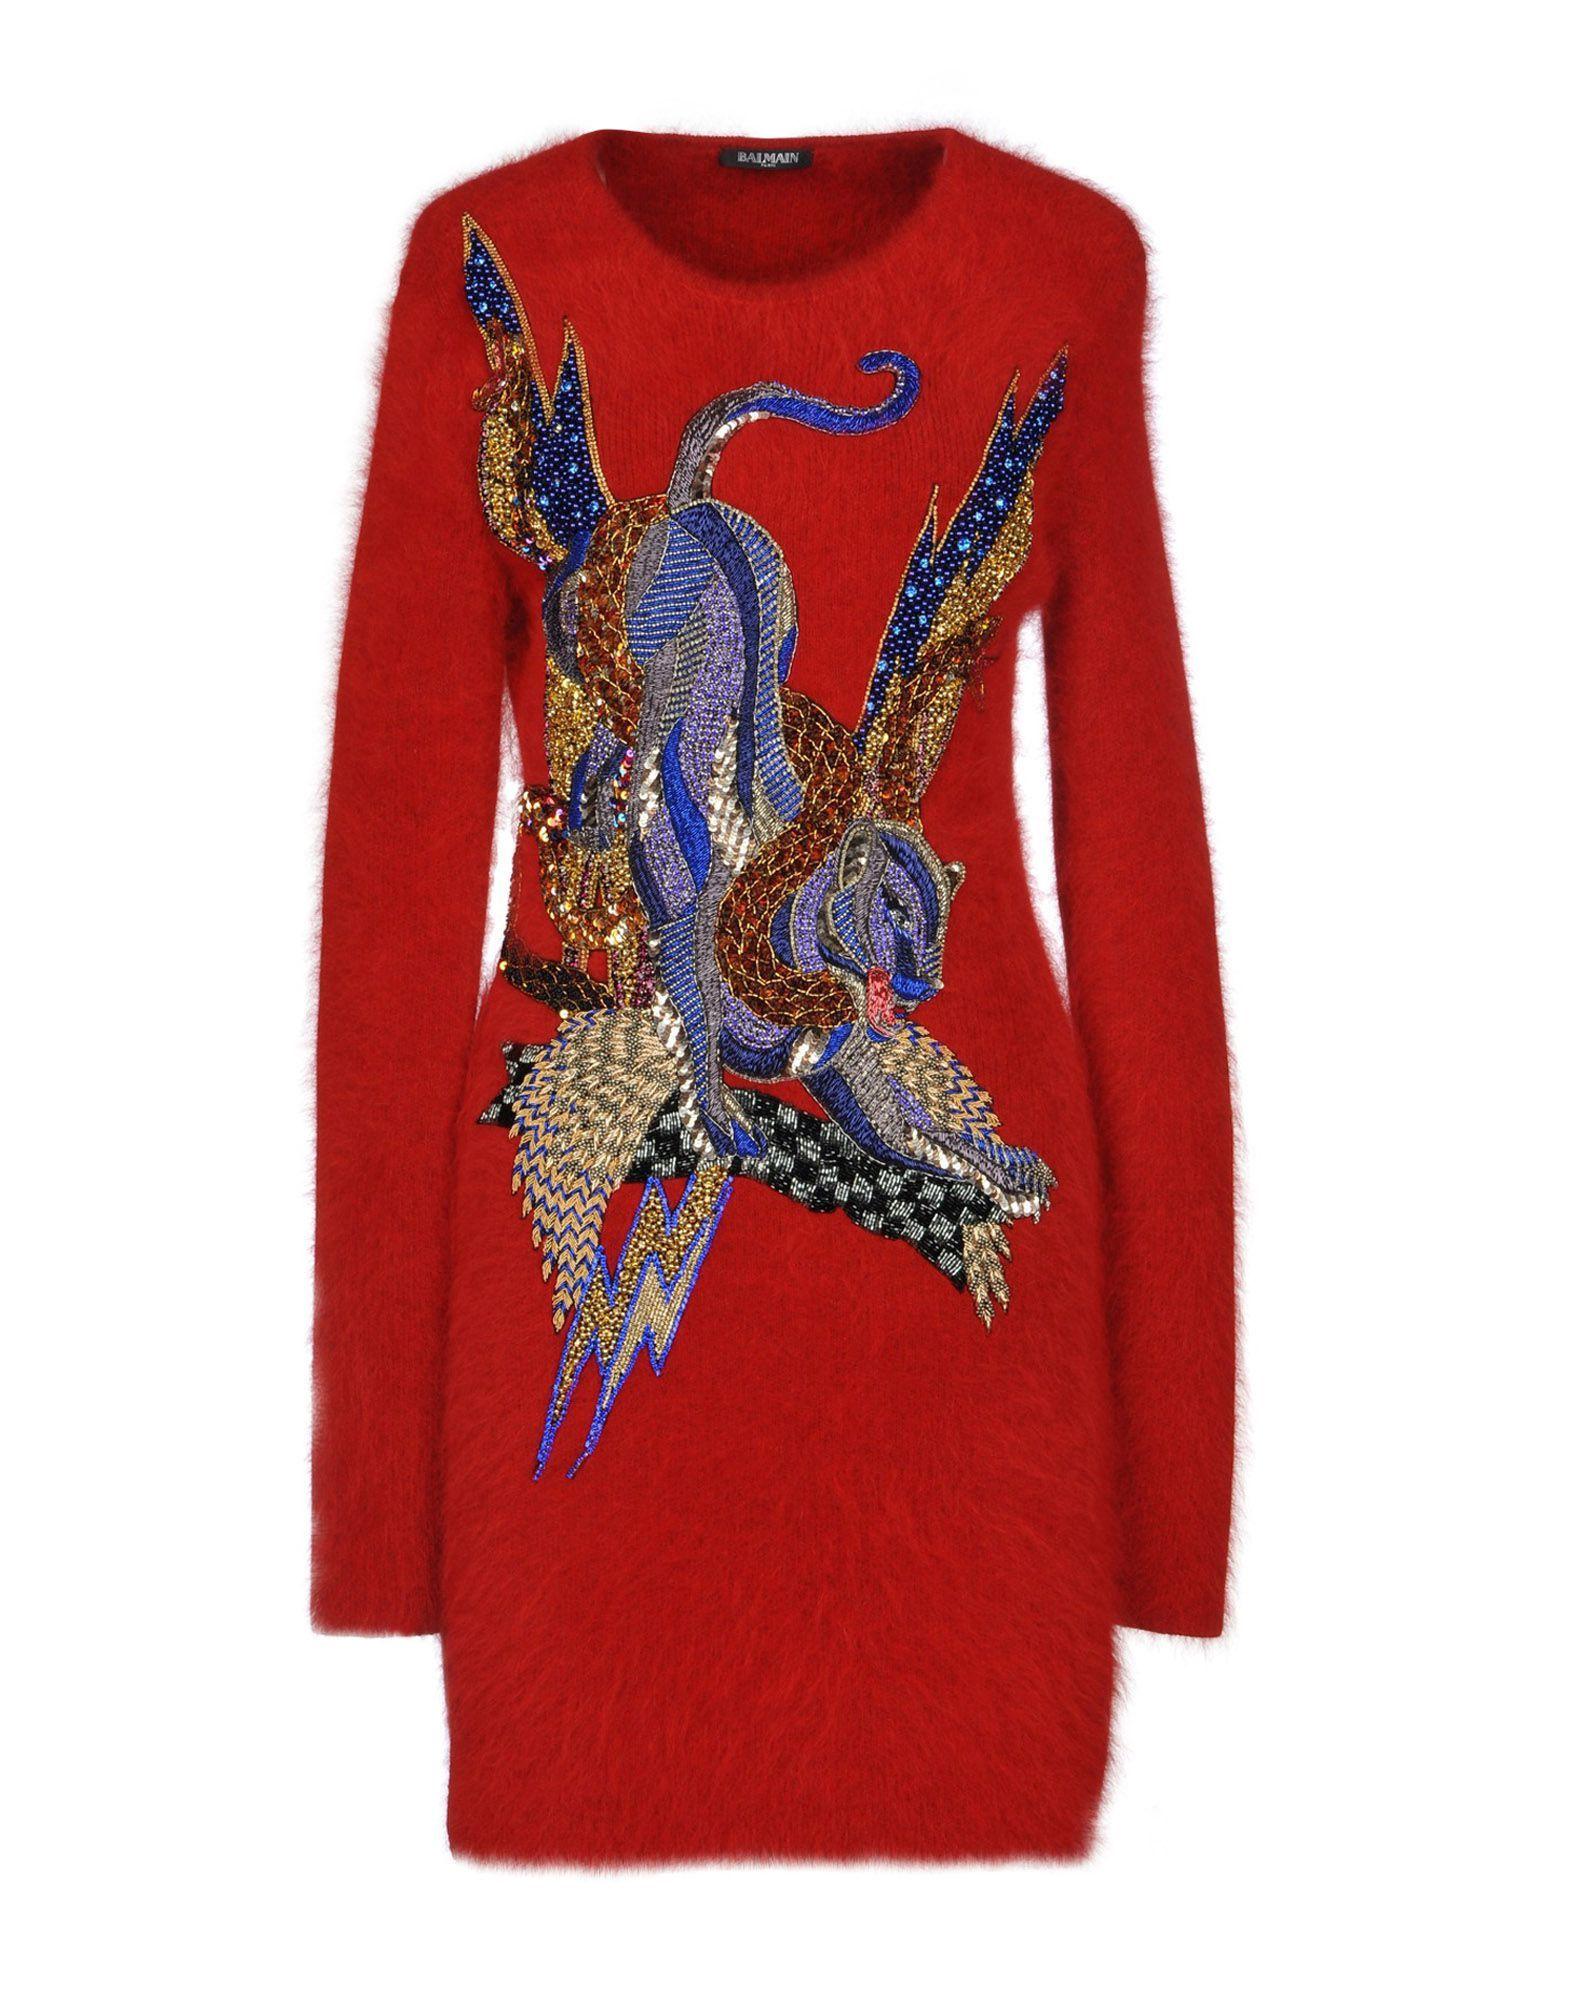 Balmain Red Angora Sequinned Knit